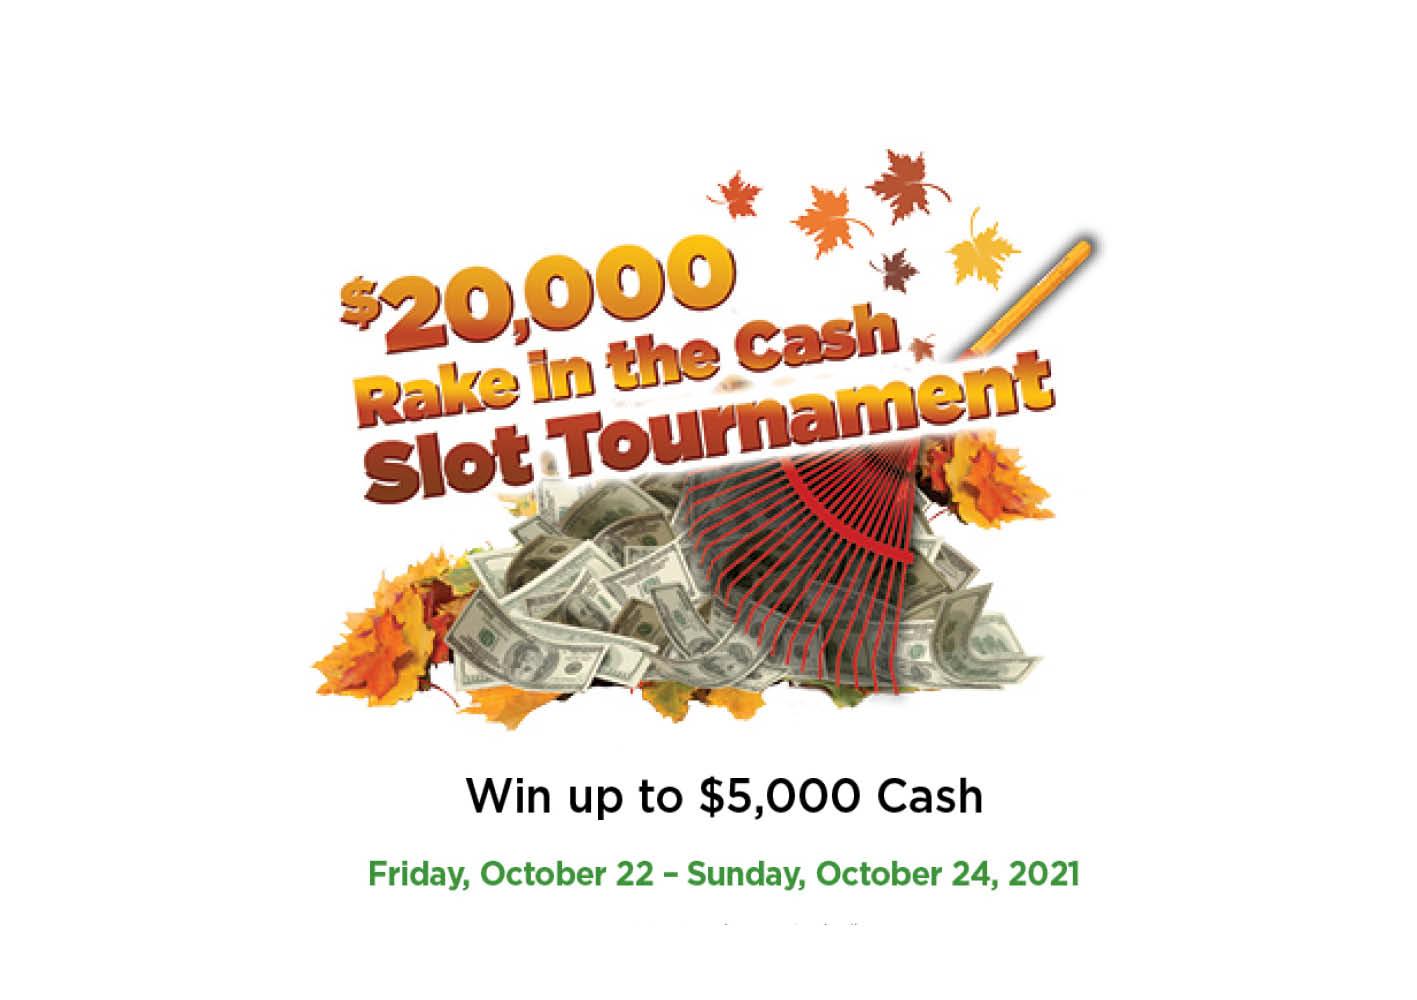 $20,000 Rake in the Cash Slot Tournament